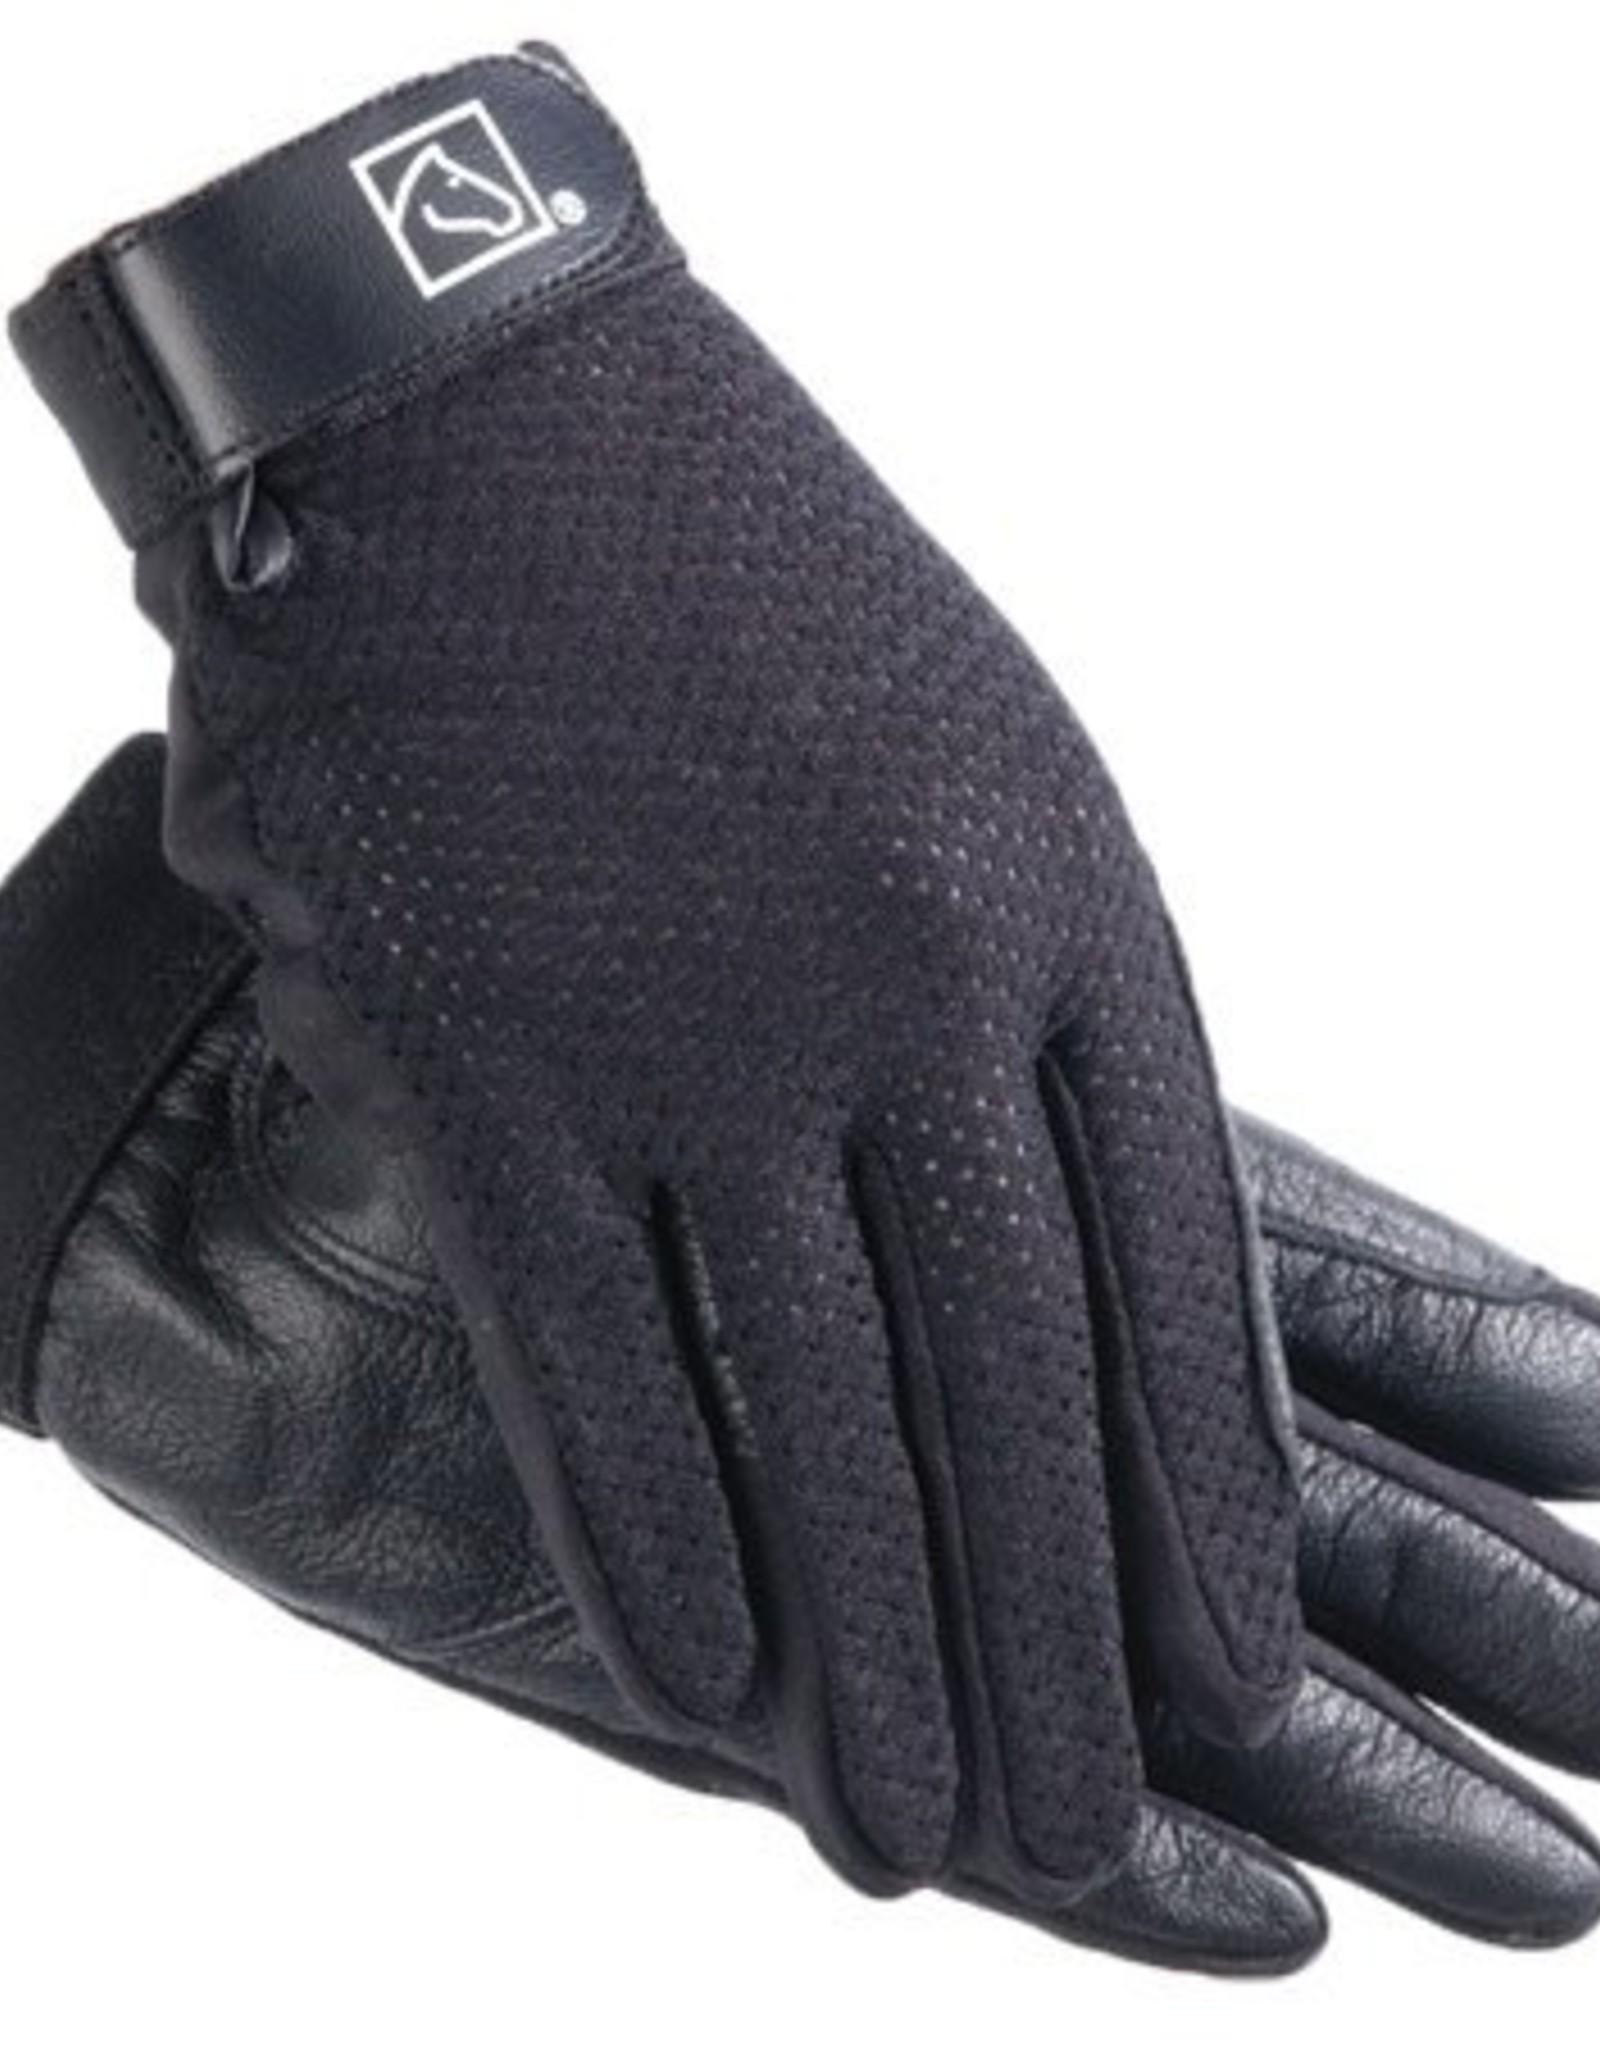 SSG SSG Kool Flo Glove Lycra Mesh Back -  Black - Ladies Size 6/7